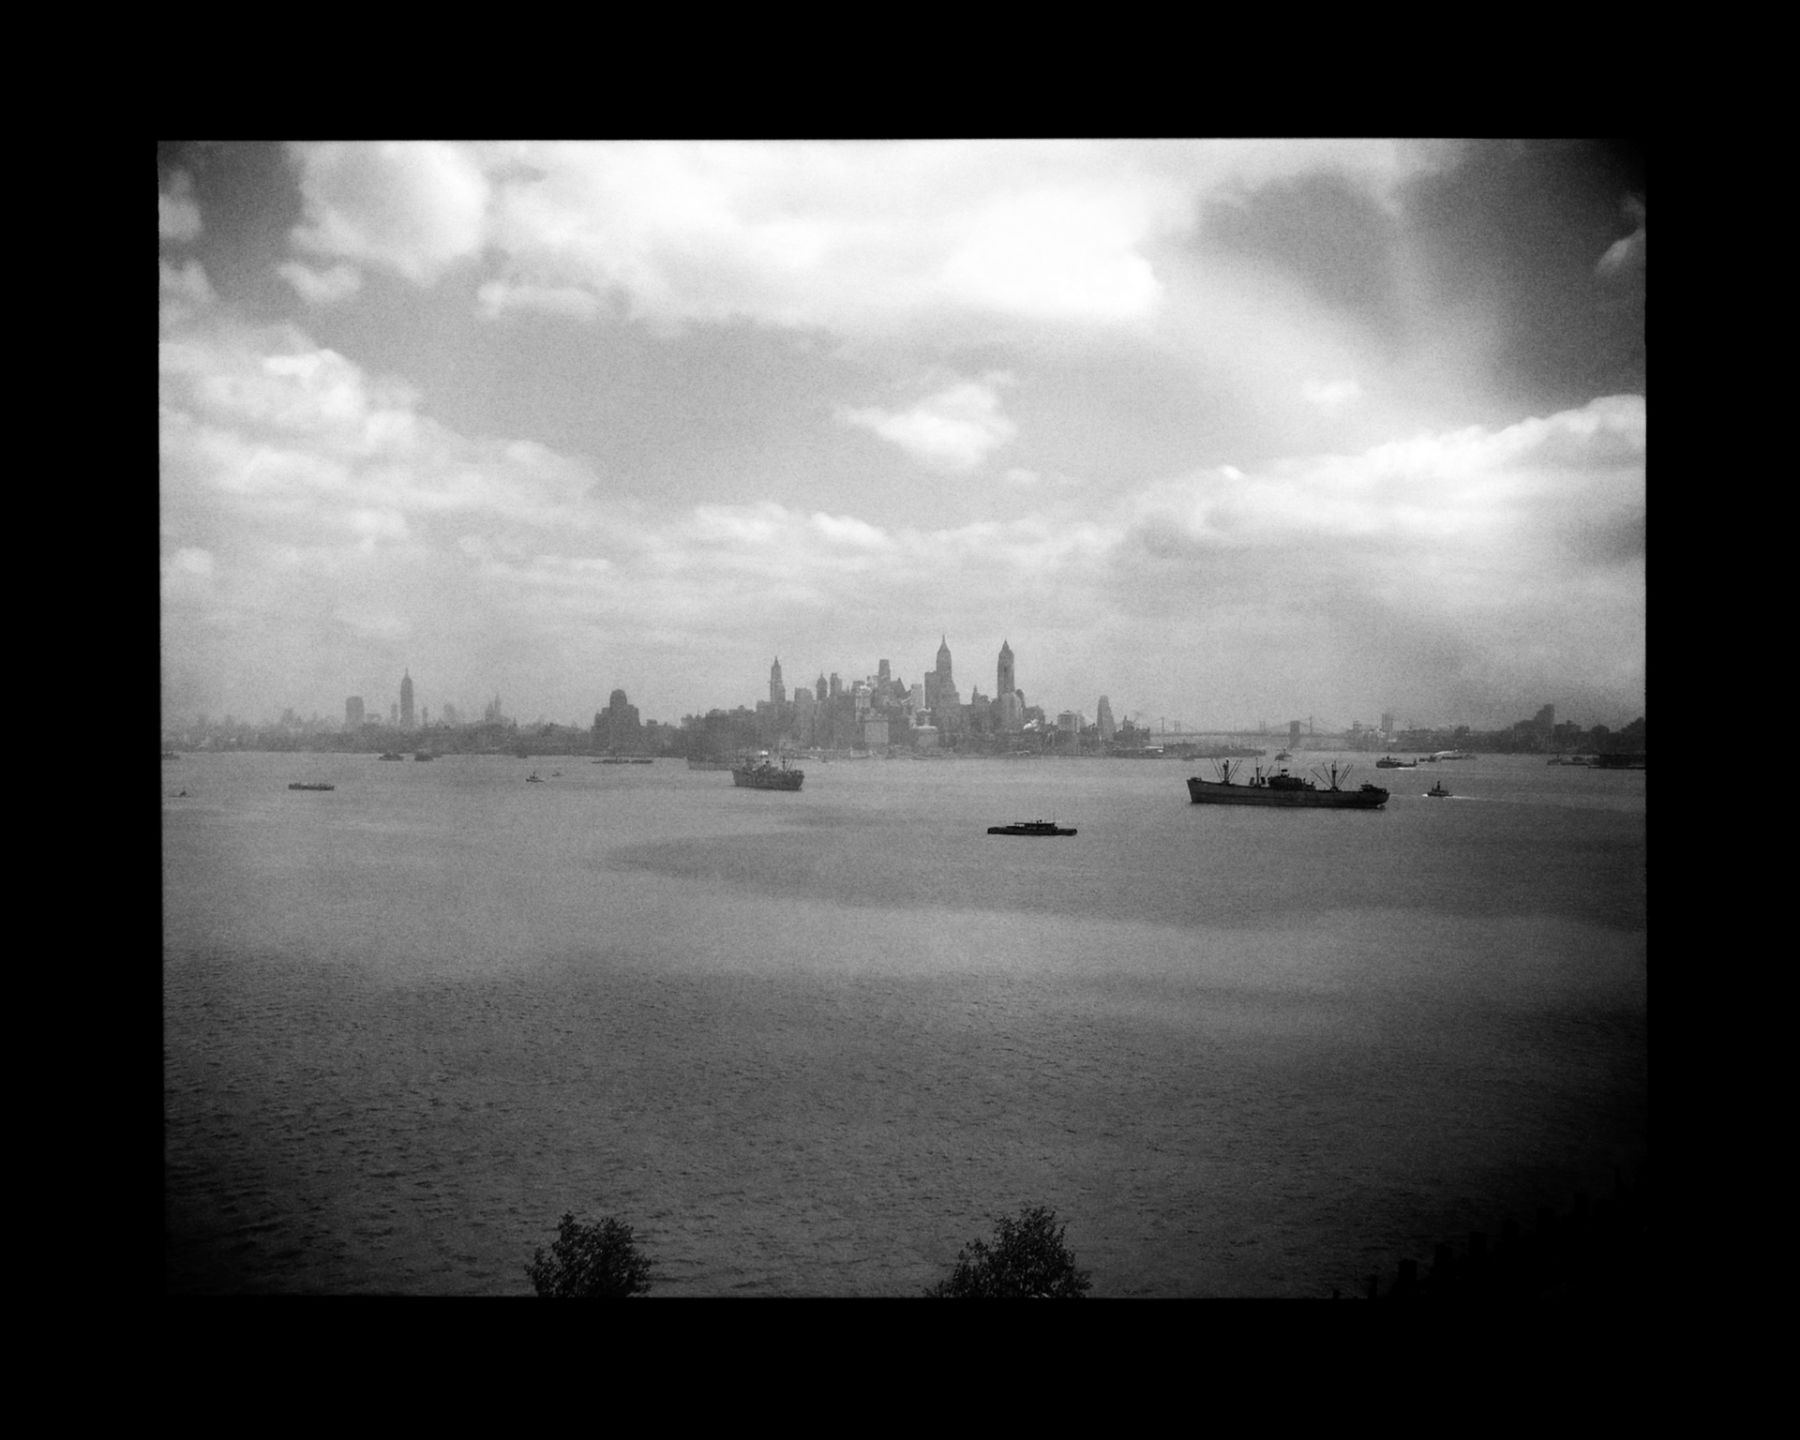 N.Y. Harbor, 1947, Silver Gelatin Photograph